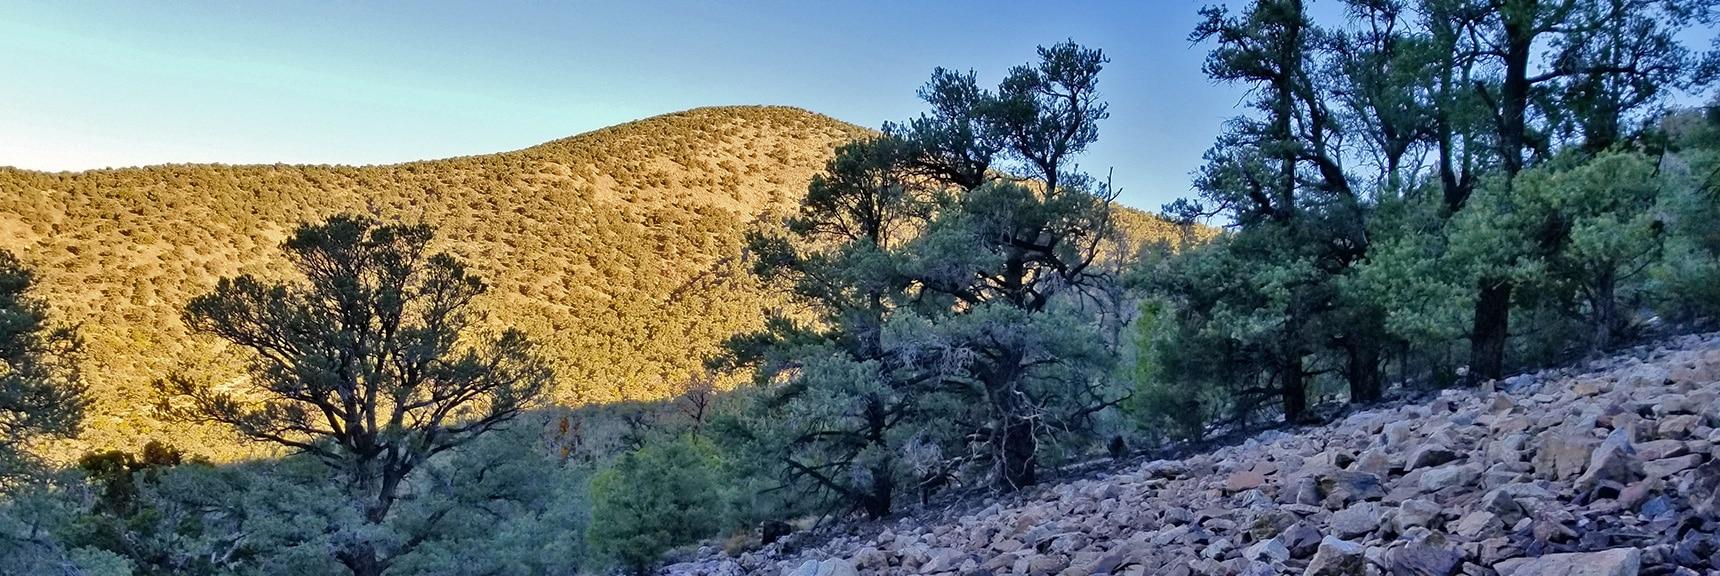 Wildrose Peak Viewed from Approach Trail Below Panamint Range Summit Ridge   Wildrose Peak   Panamint Mountain Range   Death Valley National Park, California